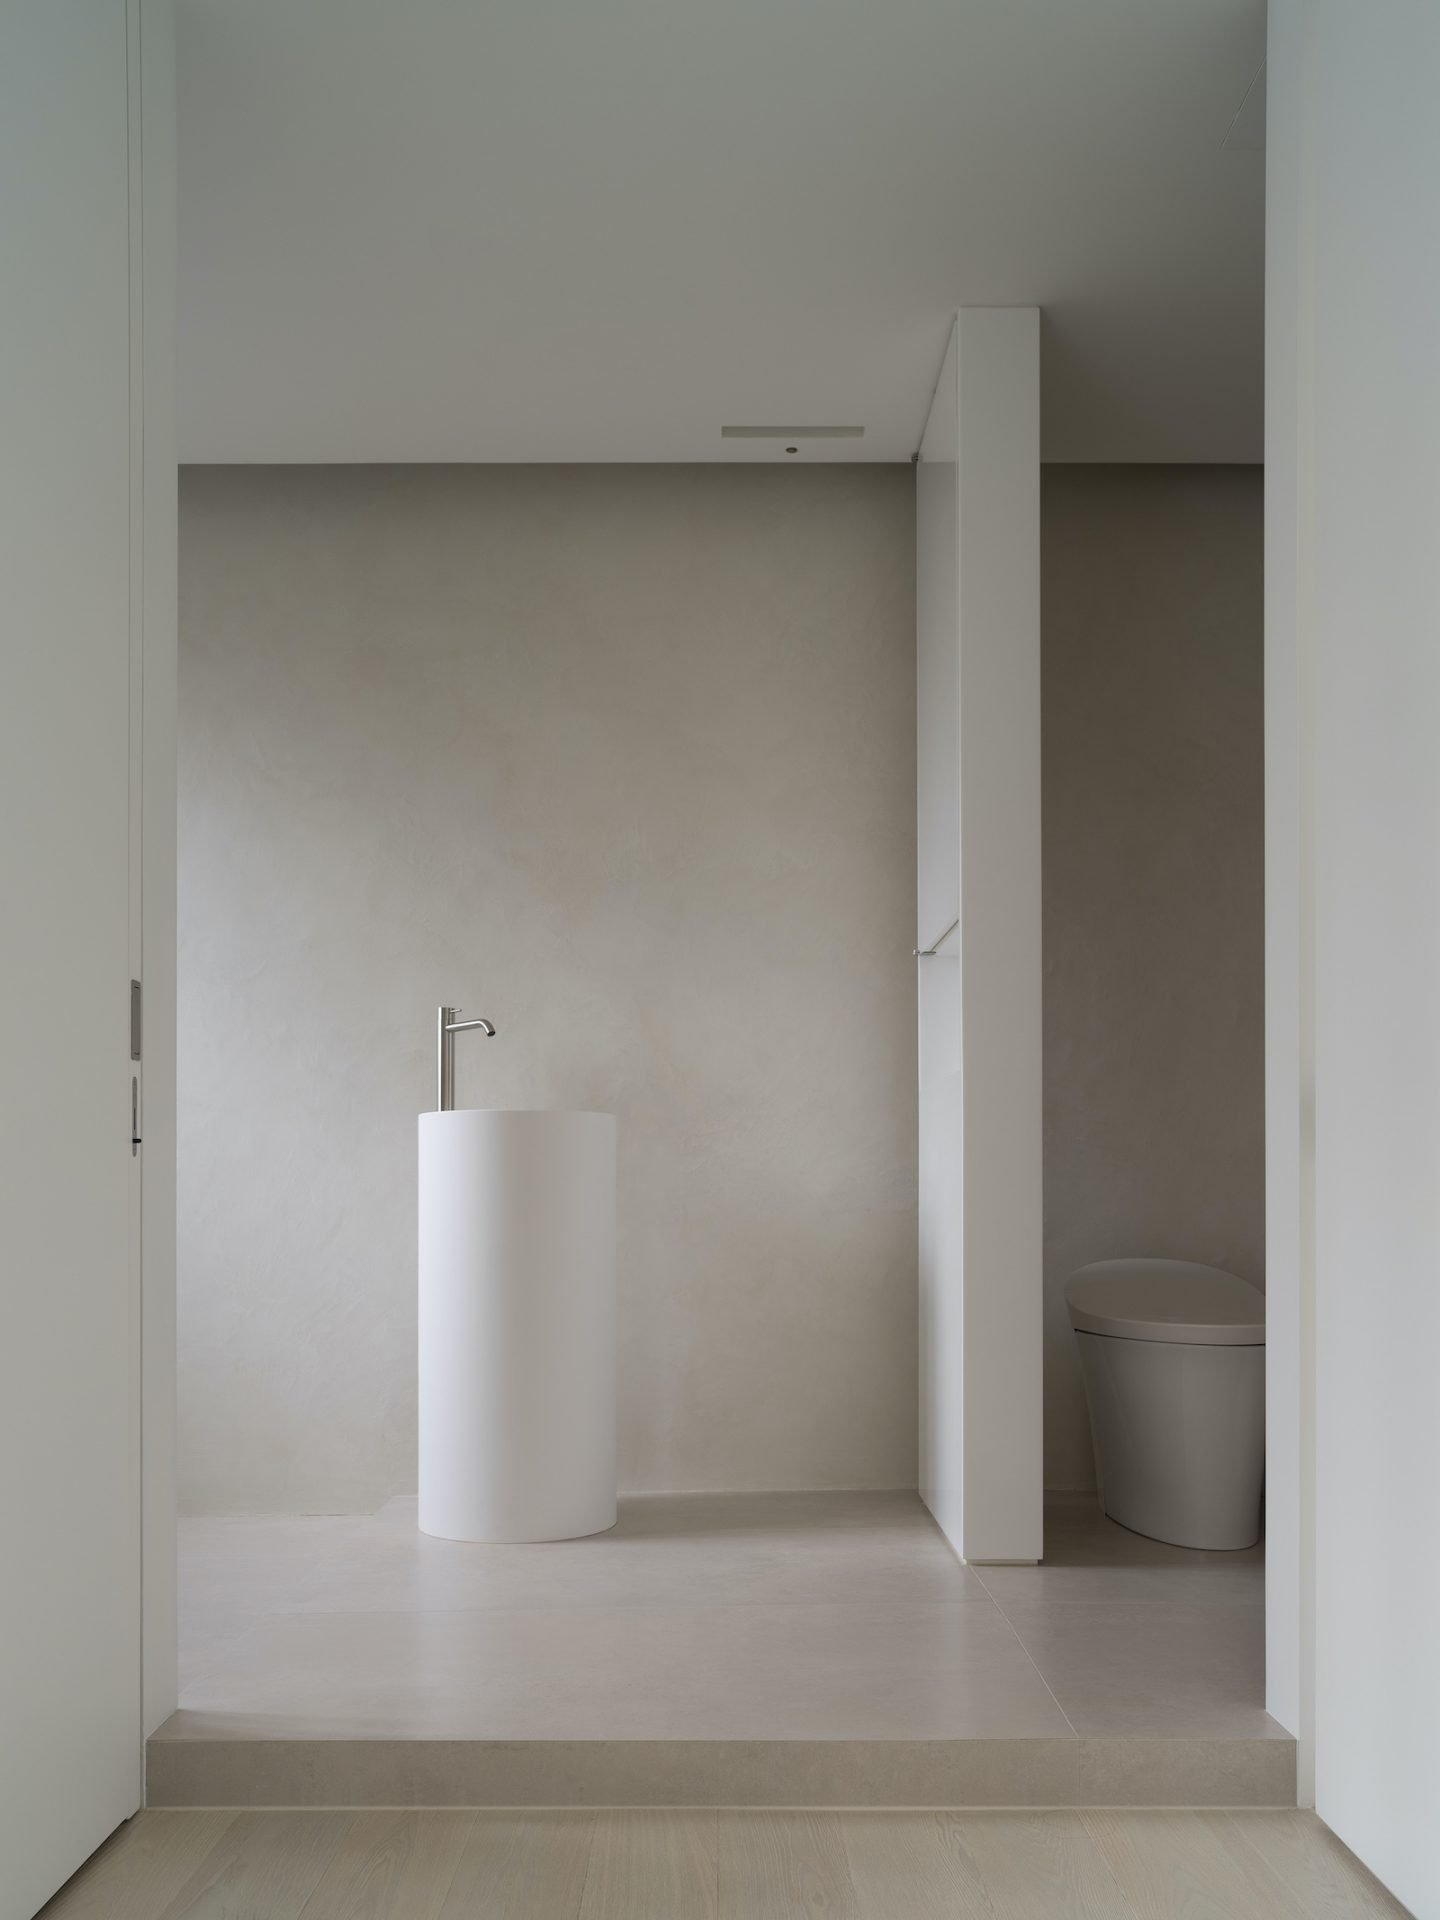 IGNANT-Architecture-Marty-Chou-KOA-Apartment-05